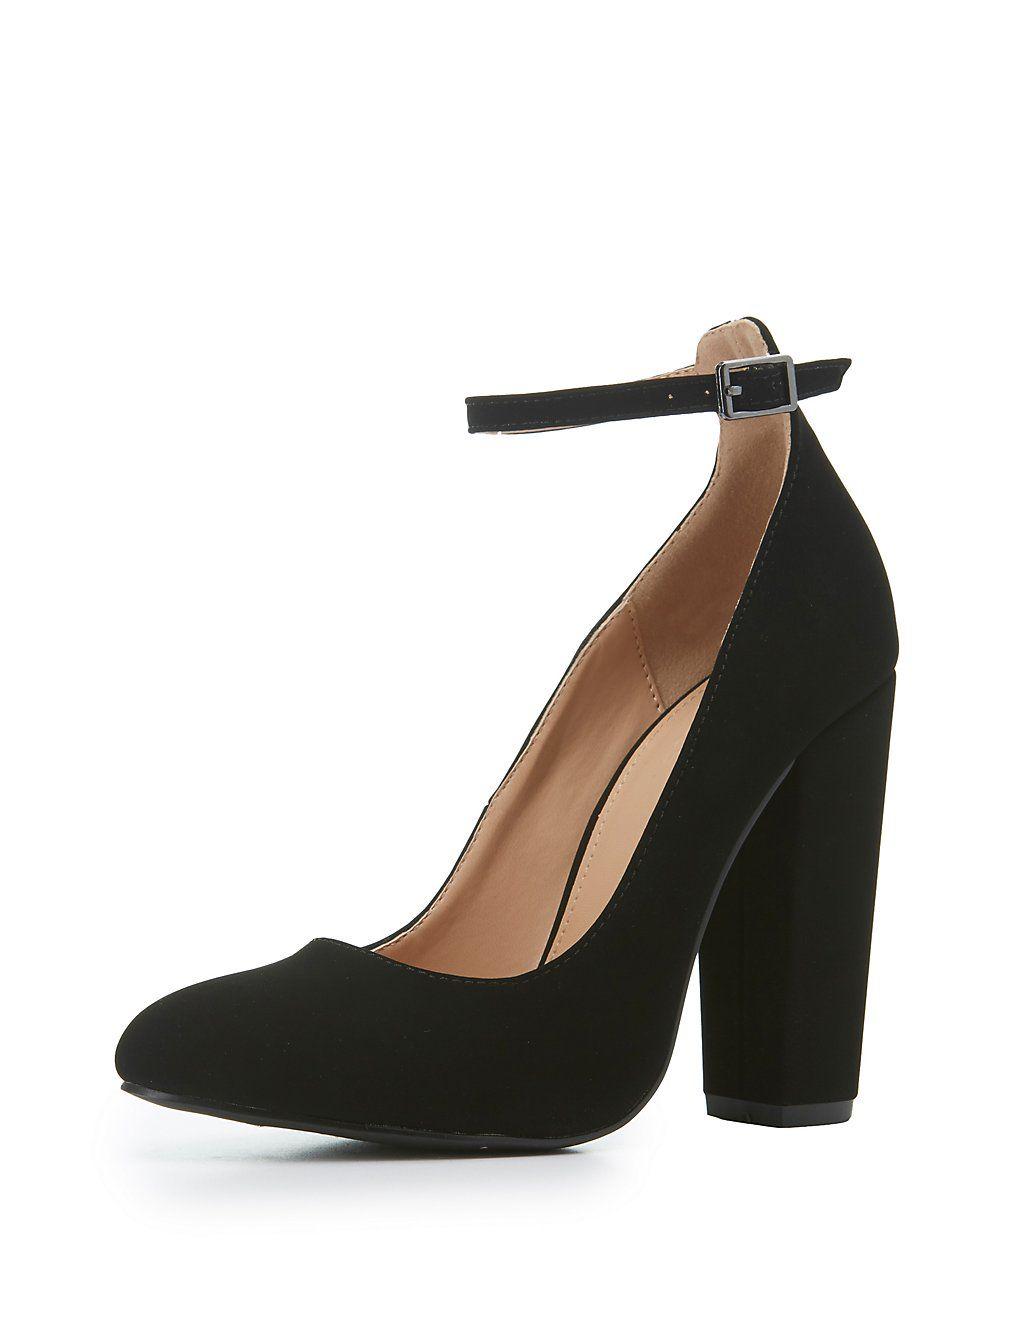 Ankle Strap Block Heel Pumps   Charlotte Russe